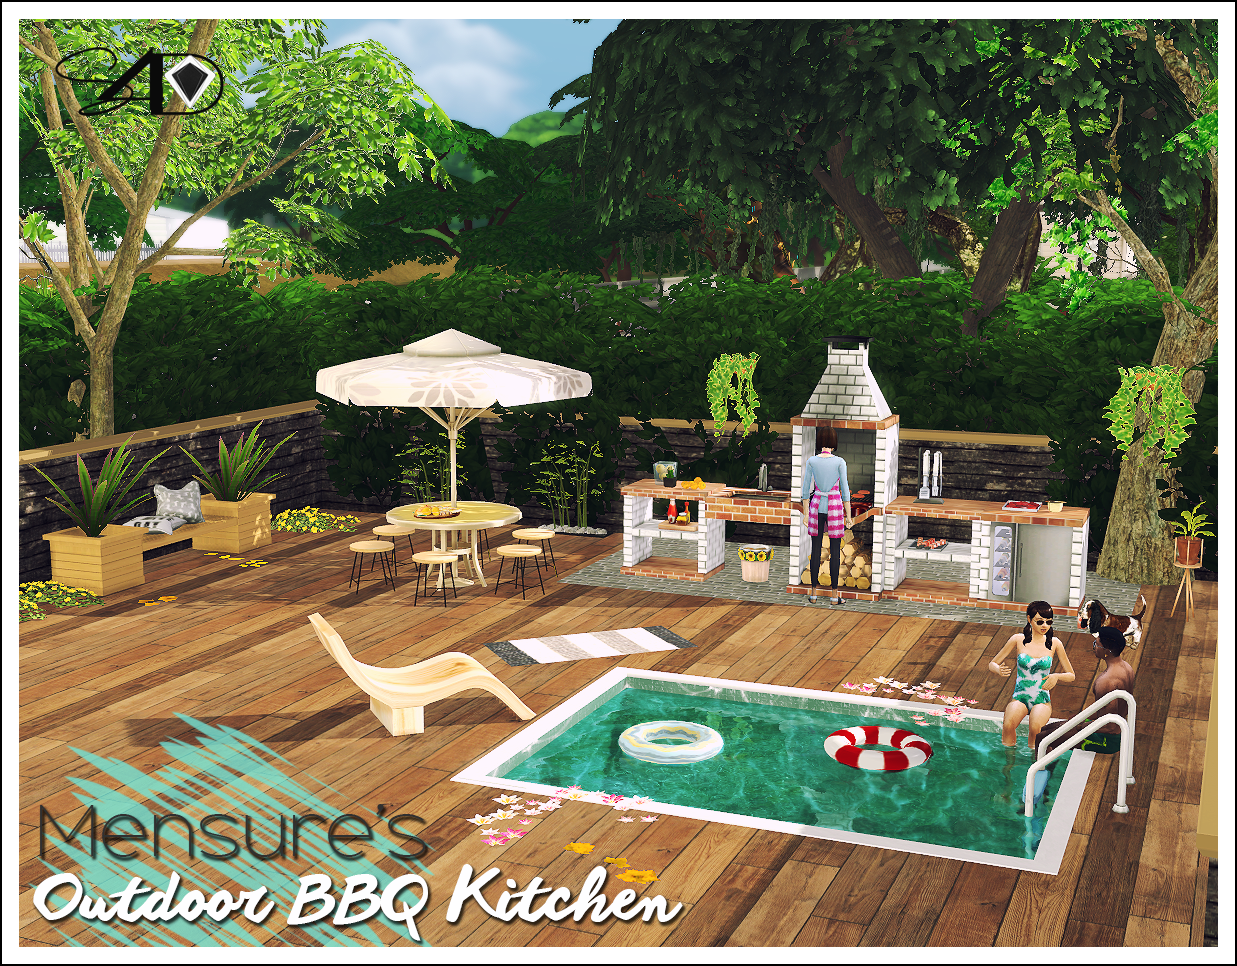 3t4 Mensure BBQ Outdoor Kitchen Set   Sims 4 Designs ...